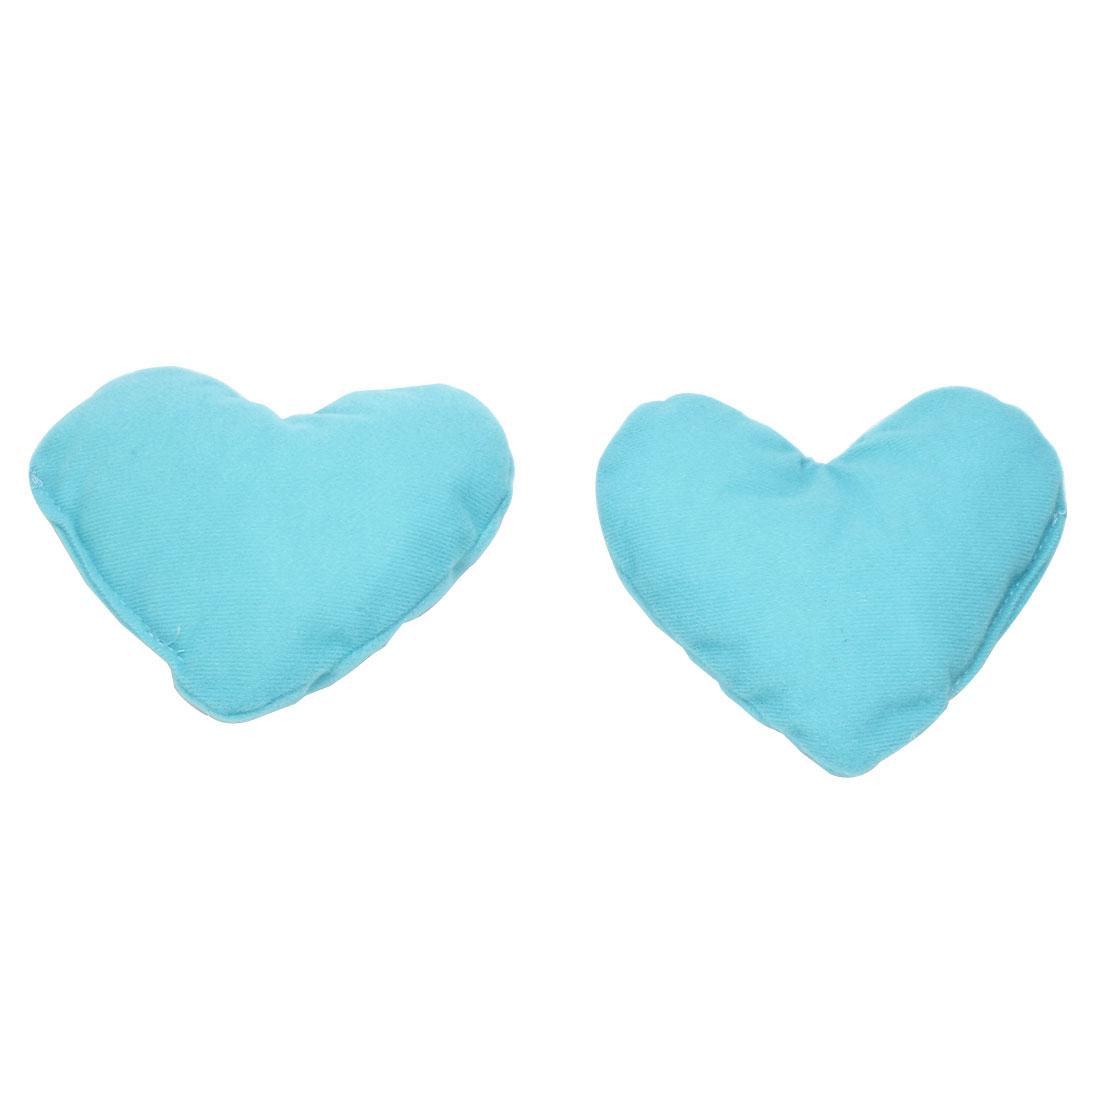 2 Pcs Light Blue Heart Shaped Pet Doggie Puppy Neck Pillow Headrest Pad Toy